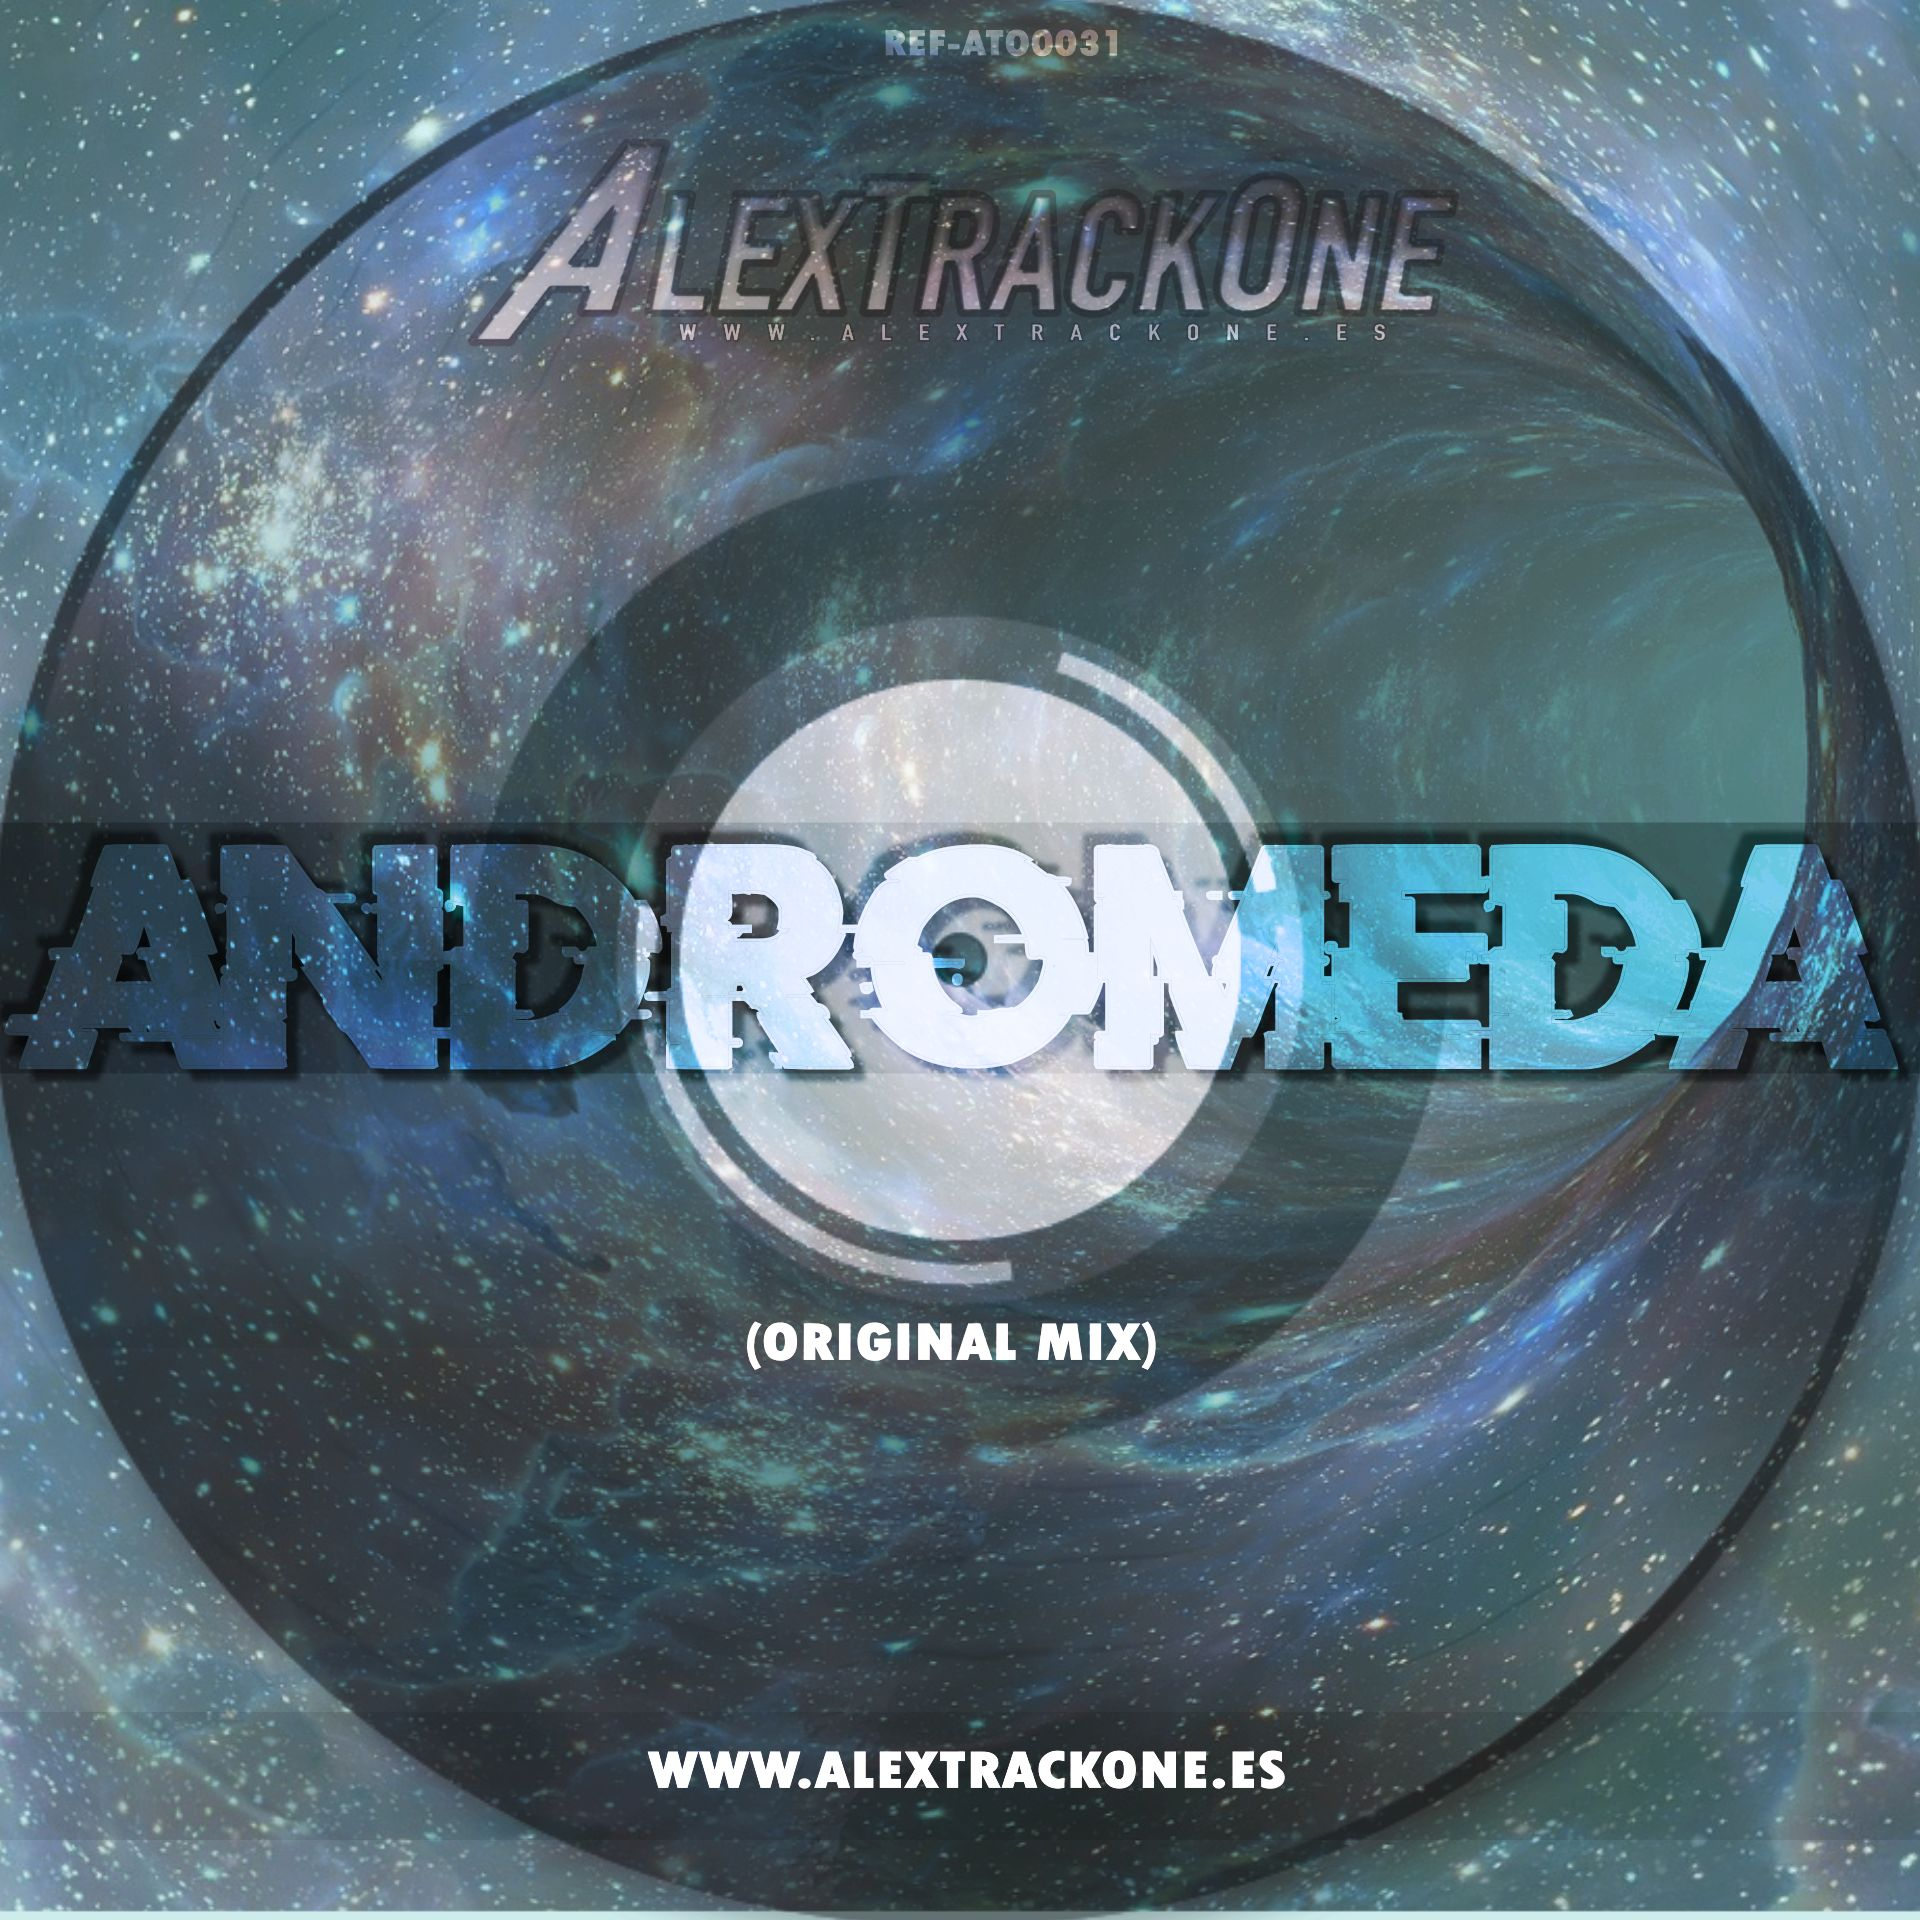 REF-ATO0031 ANDROMEDA (ORIGINAL MIX) (MP3 & WAV)